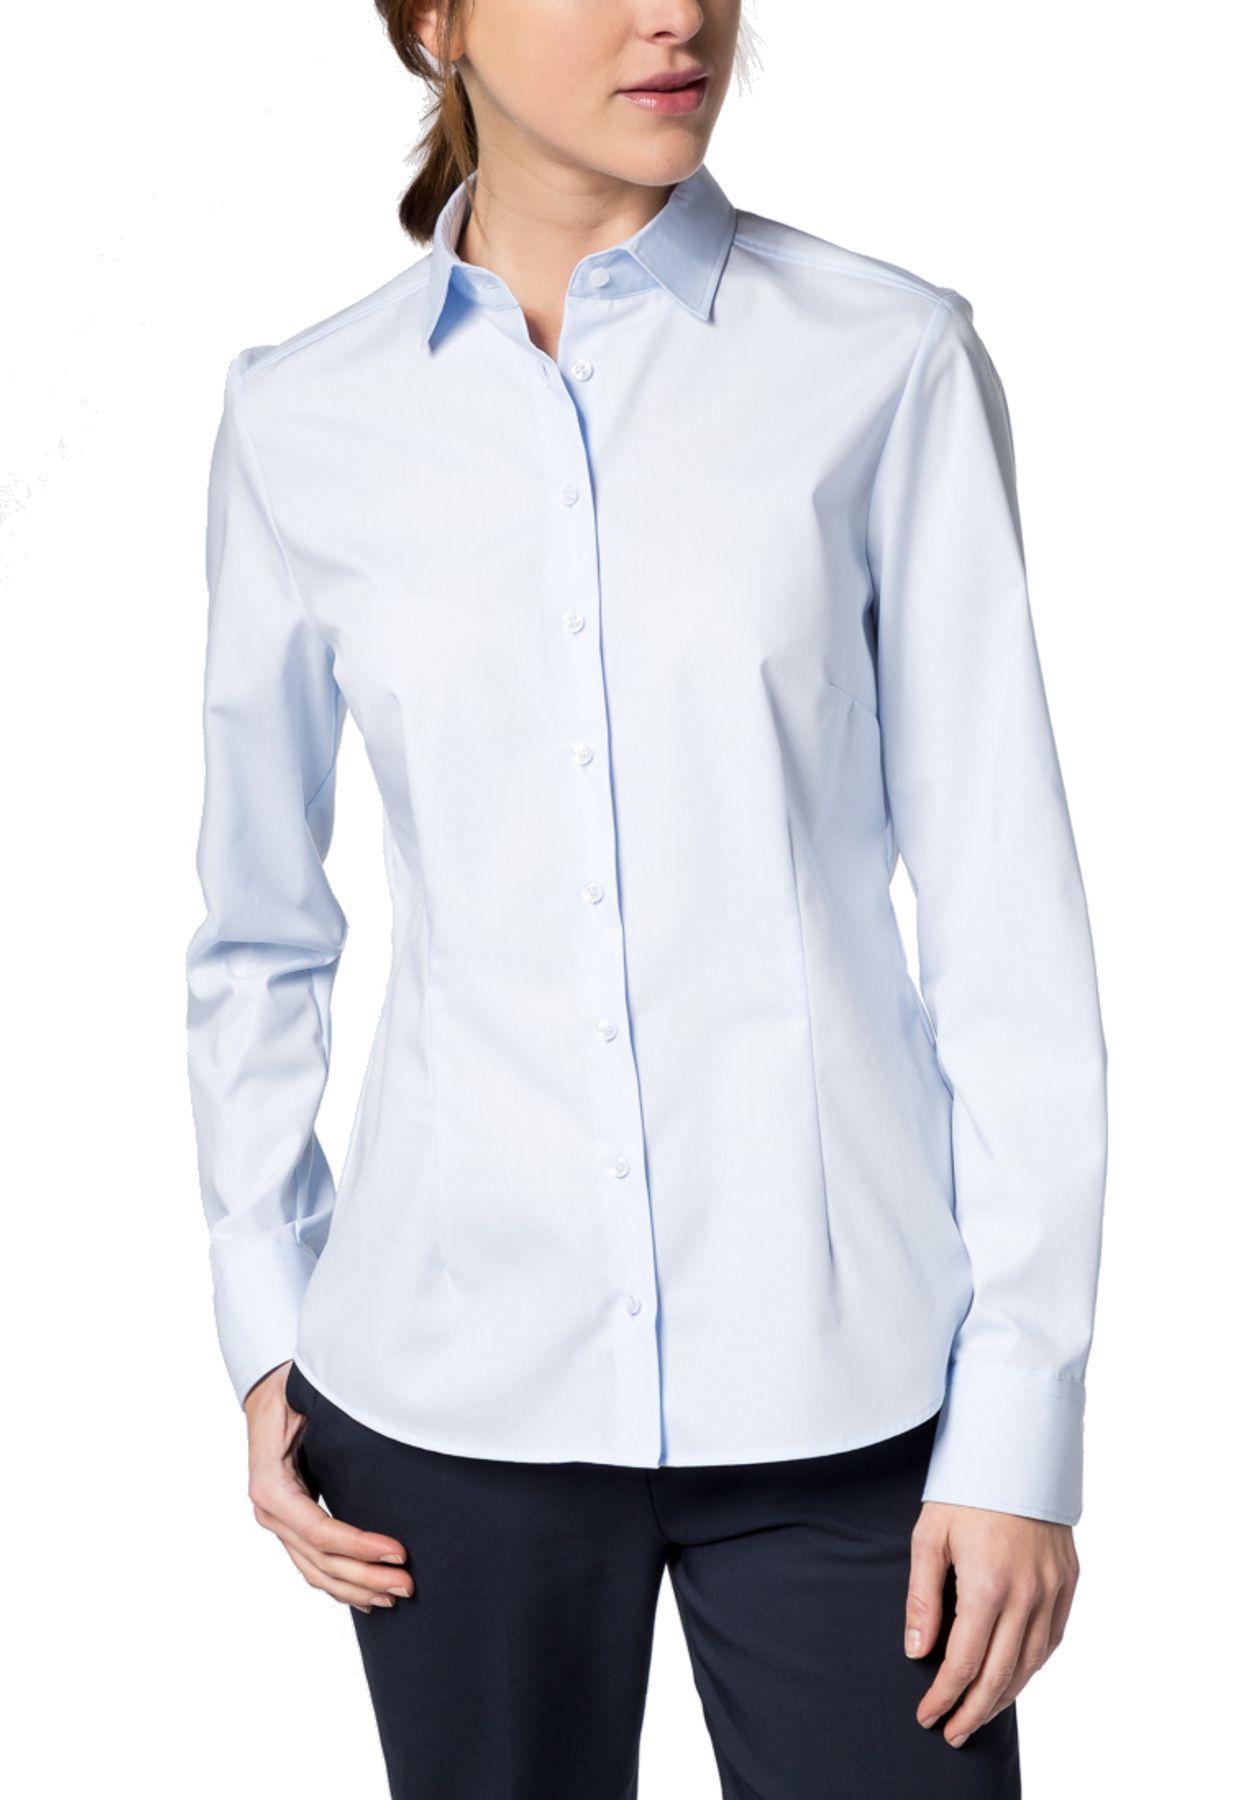 Eterna -  Comfort-Fit - Damen Langarm-Bluse Modern Classic Unifarben  (5220 D790) – Bild 7